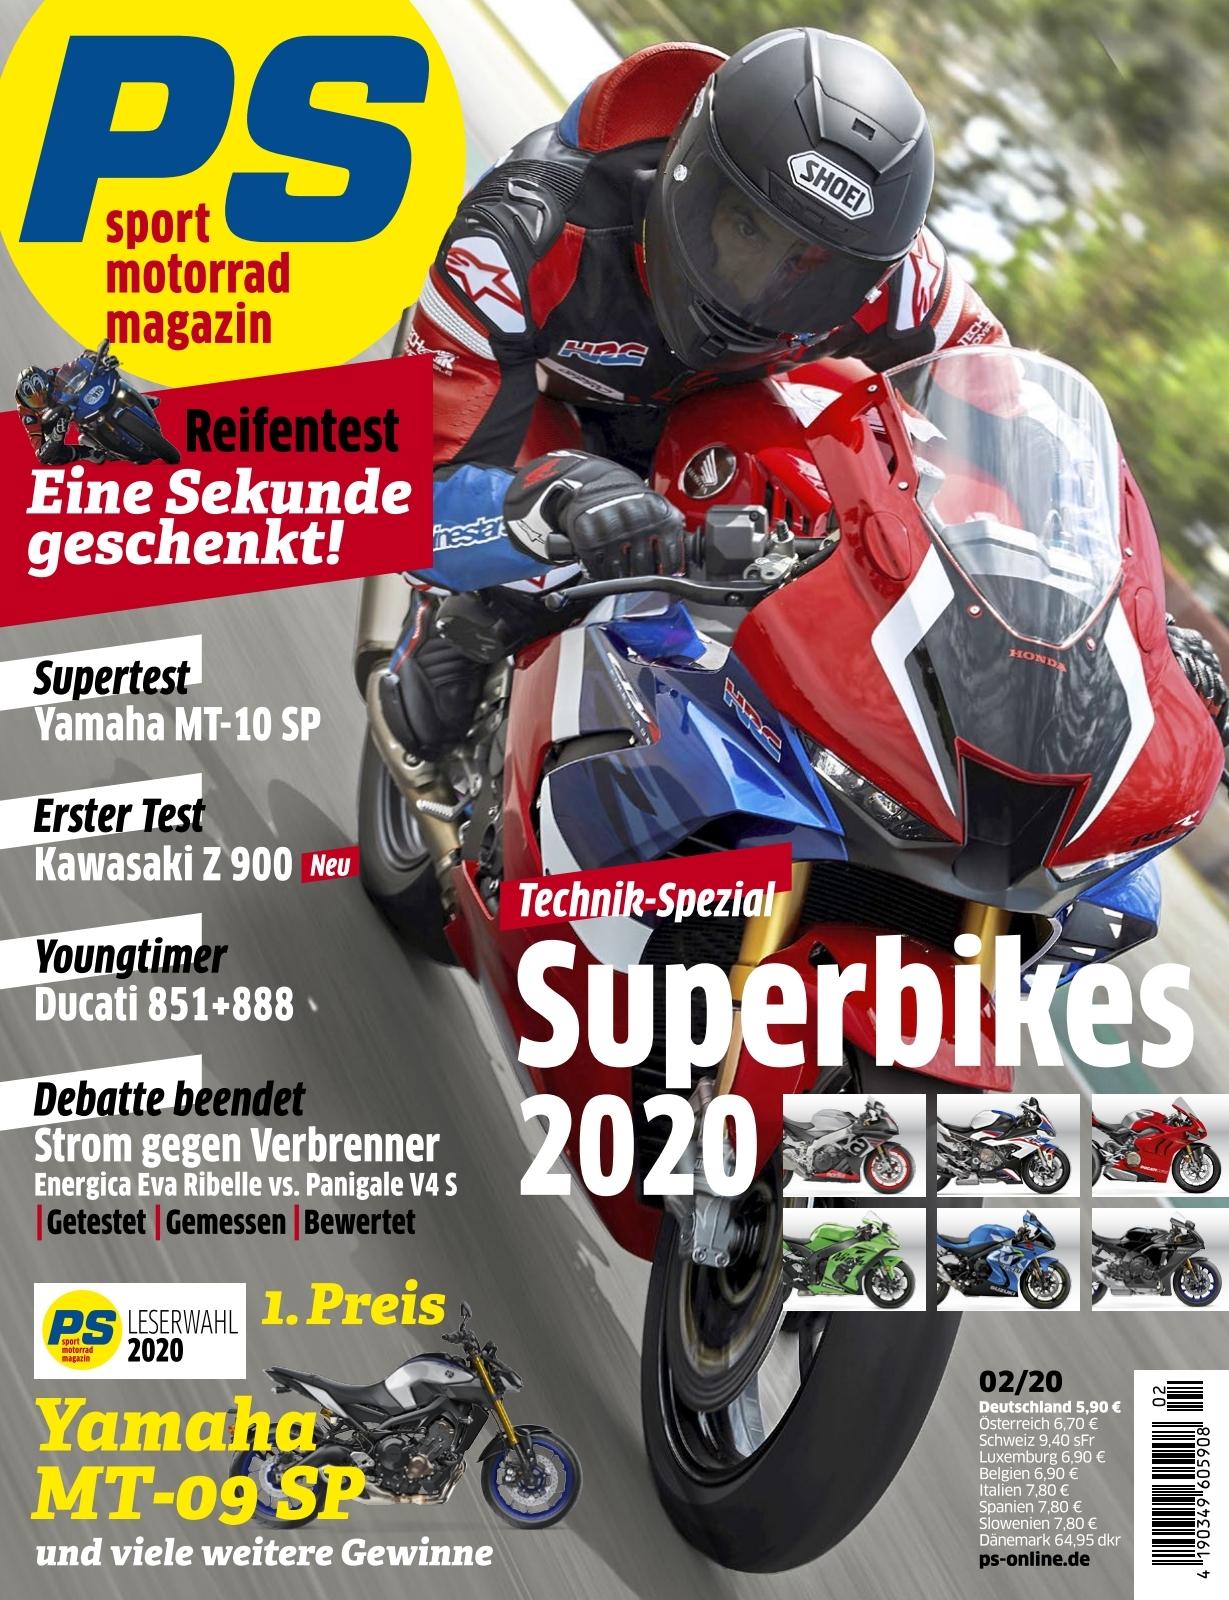 Naked Domino Motorrad Griffe aus Gummi Racing Grips f/ür Sportbike schwarz//grau Turer